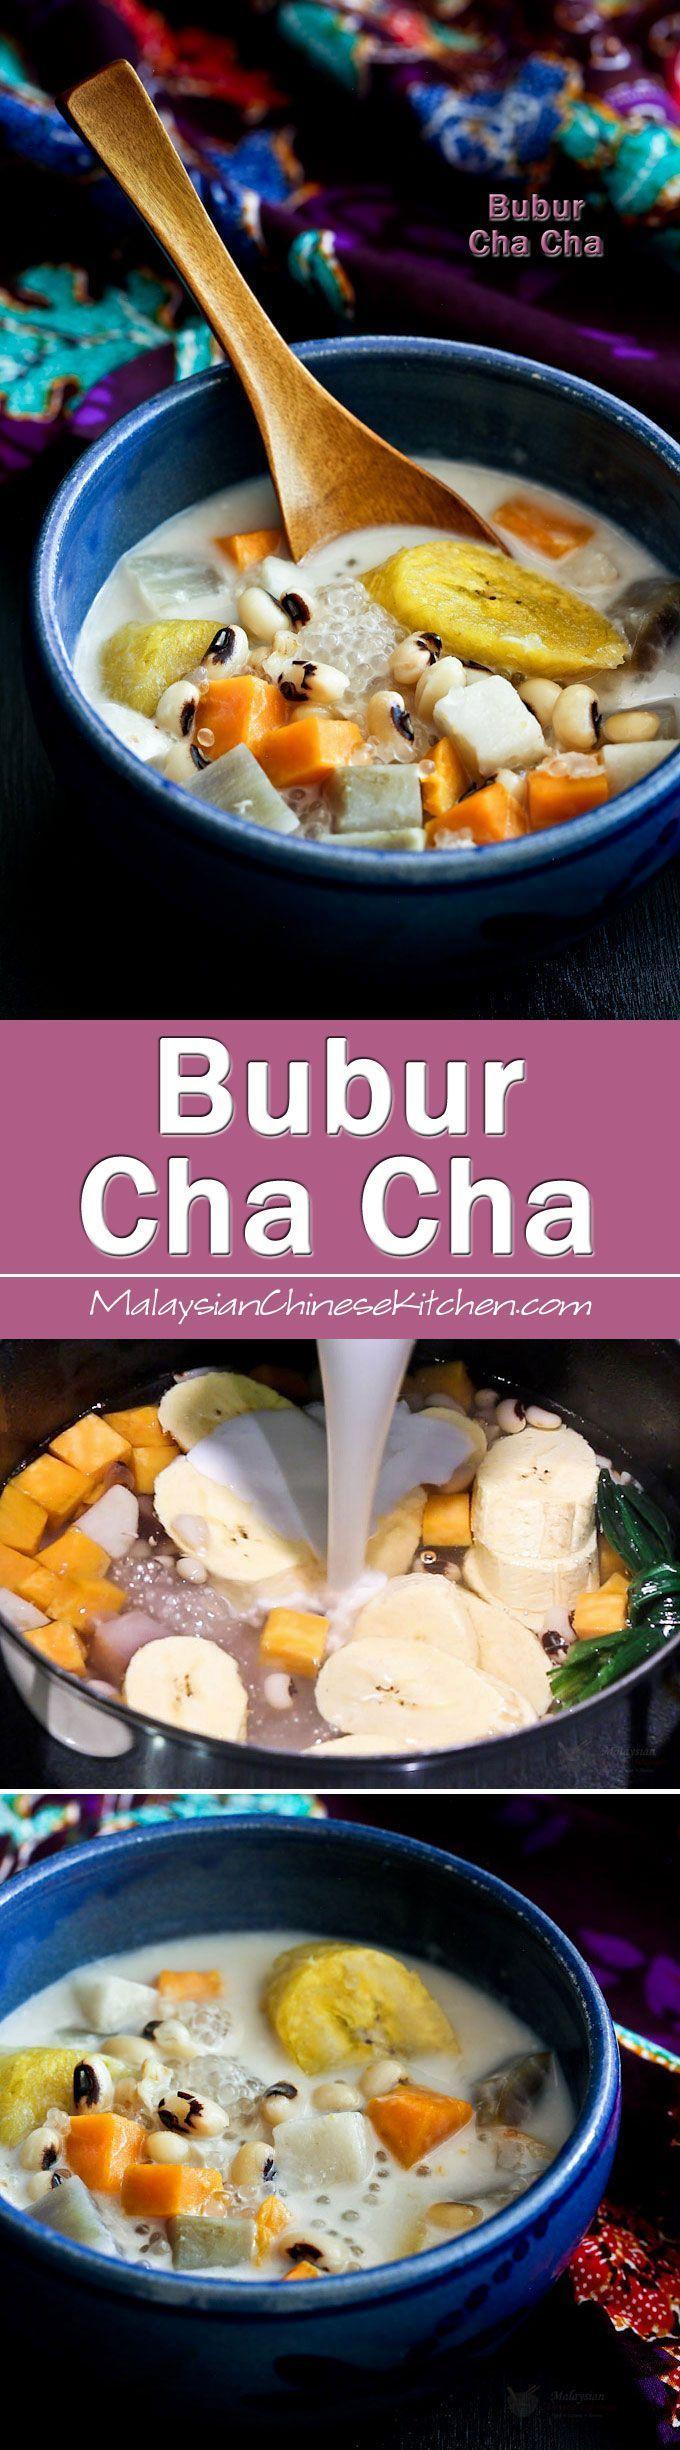 Bubur Cha Cha, a popular Malaysian coconut based dessert with yam, taro, sweet potatoes, black eyed peas, and bananas. Very delicious and satisfying.   MalaysianChineseKitchen.com